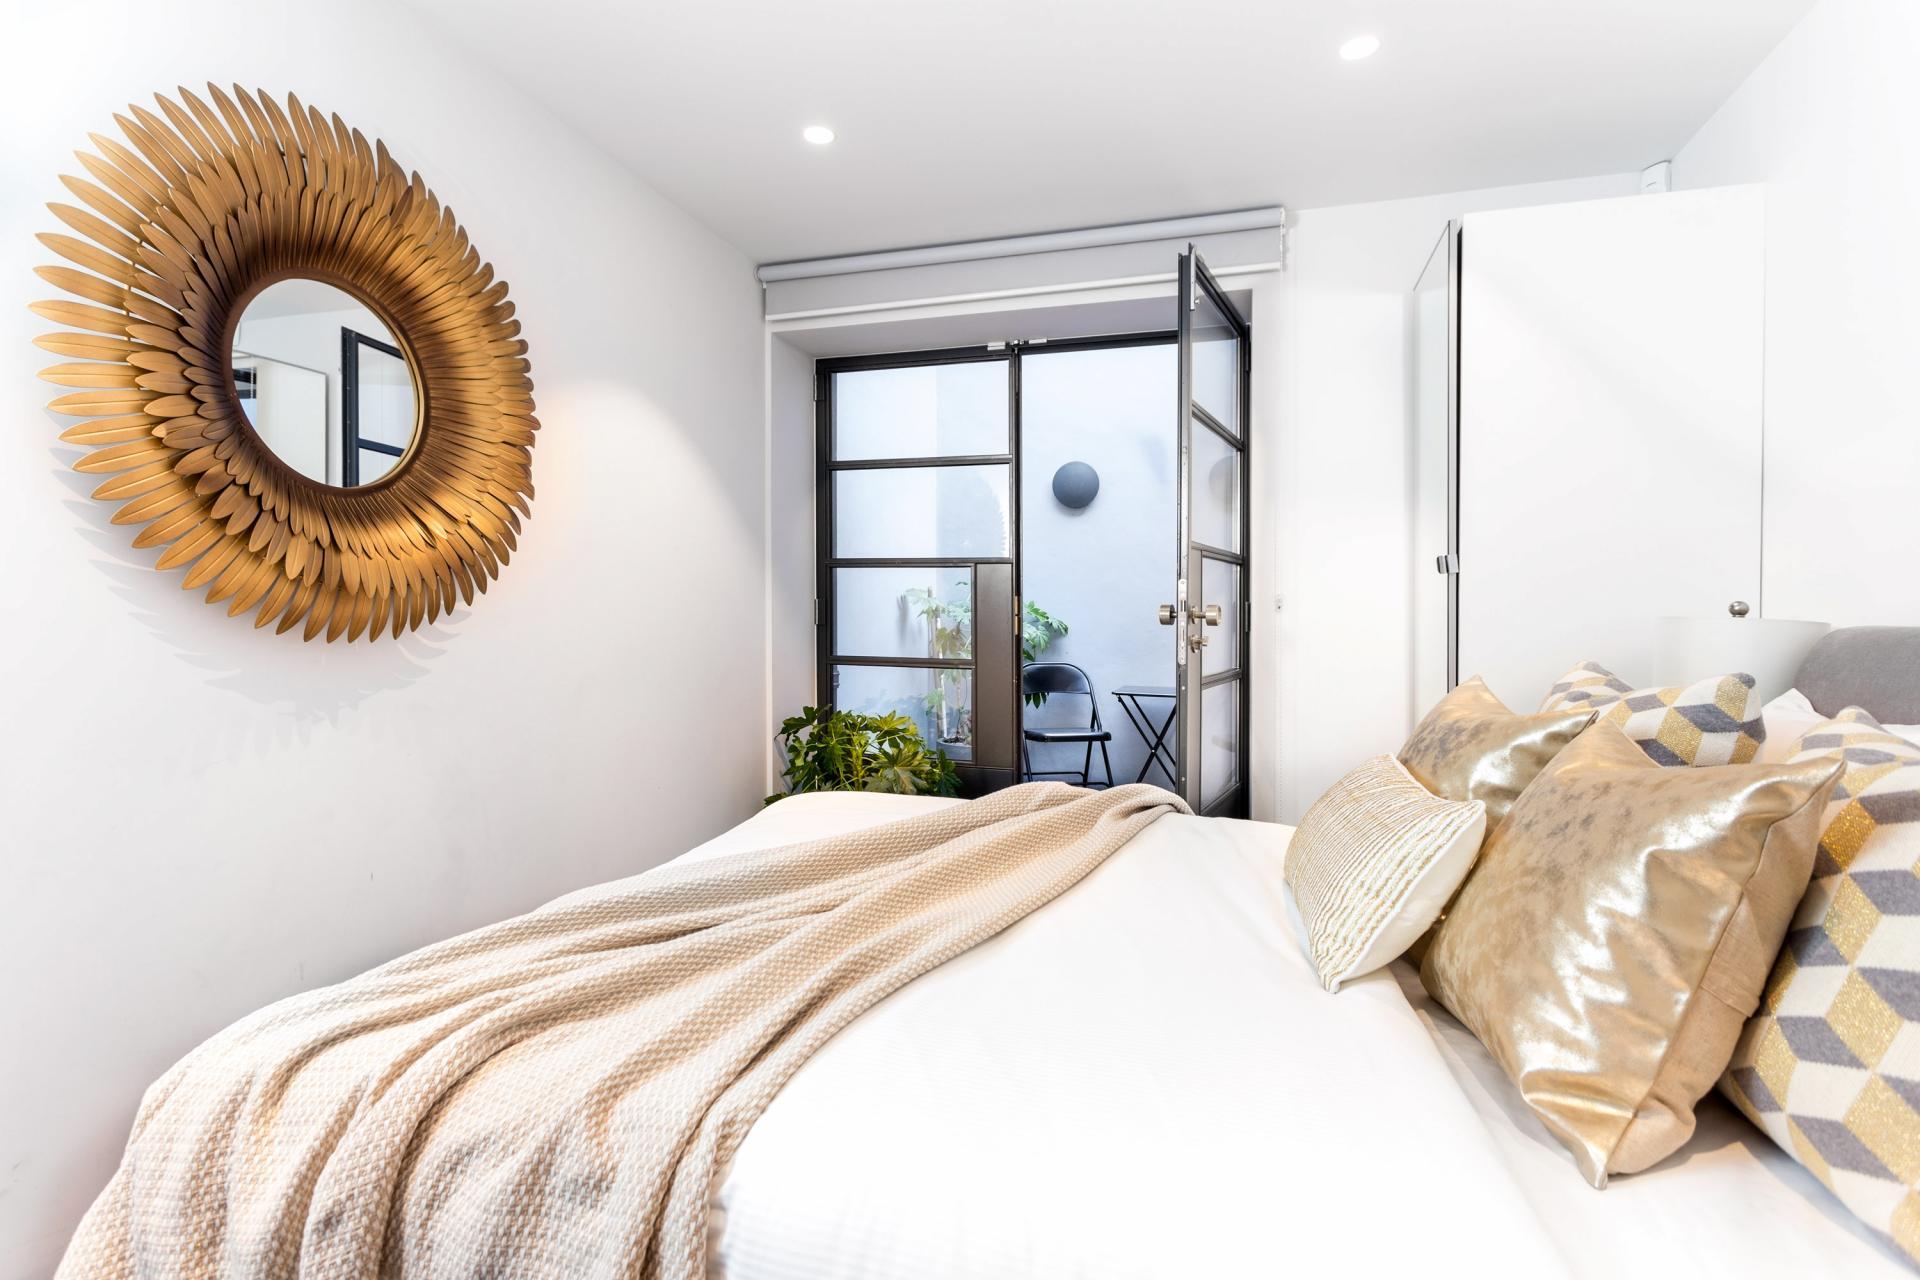 Bed at Royalty Mews, Carnaby, London - Citybase Apartments